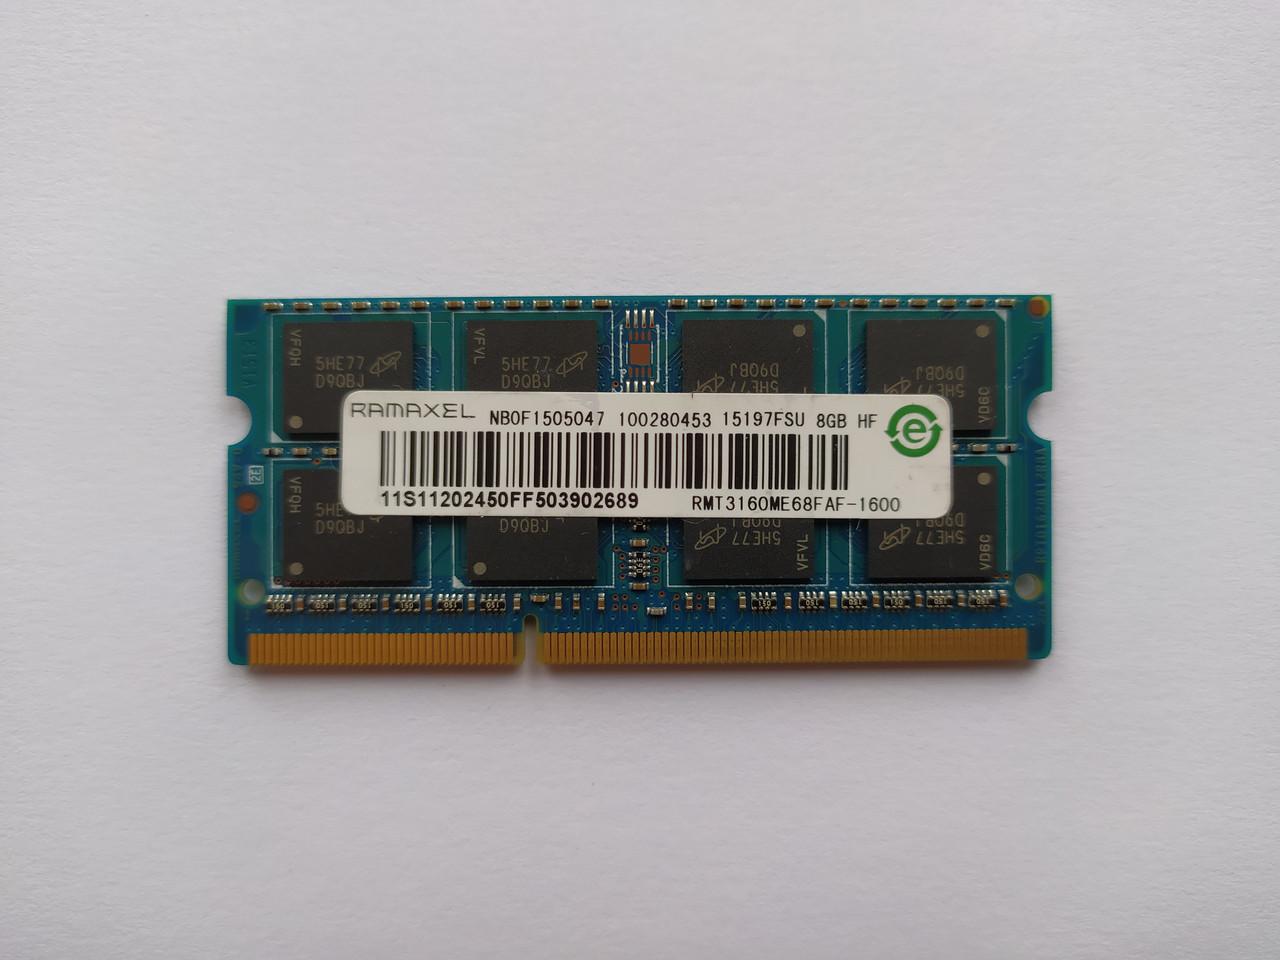 Оперативная память для ноутбука SODIMM Ramaxel DDR3 8Gb 1600MHz PC3-12800S (RMT3160ME68FAF-1600) Б/У